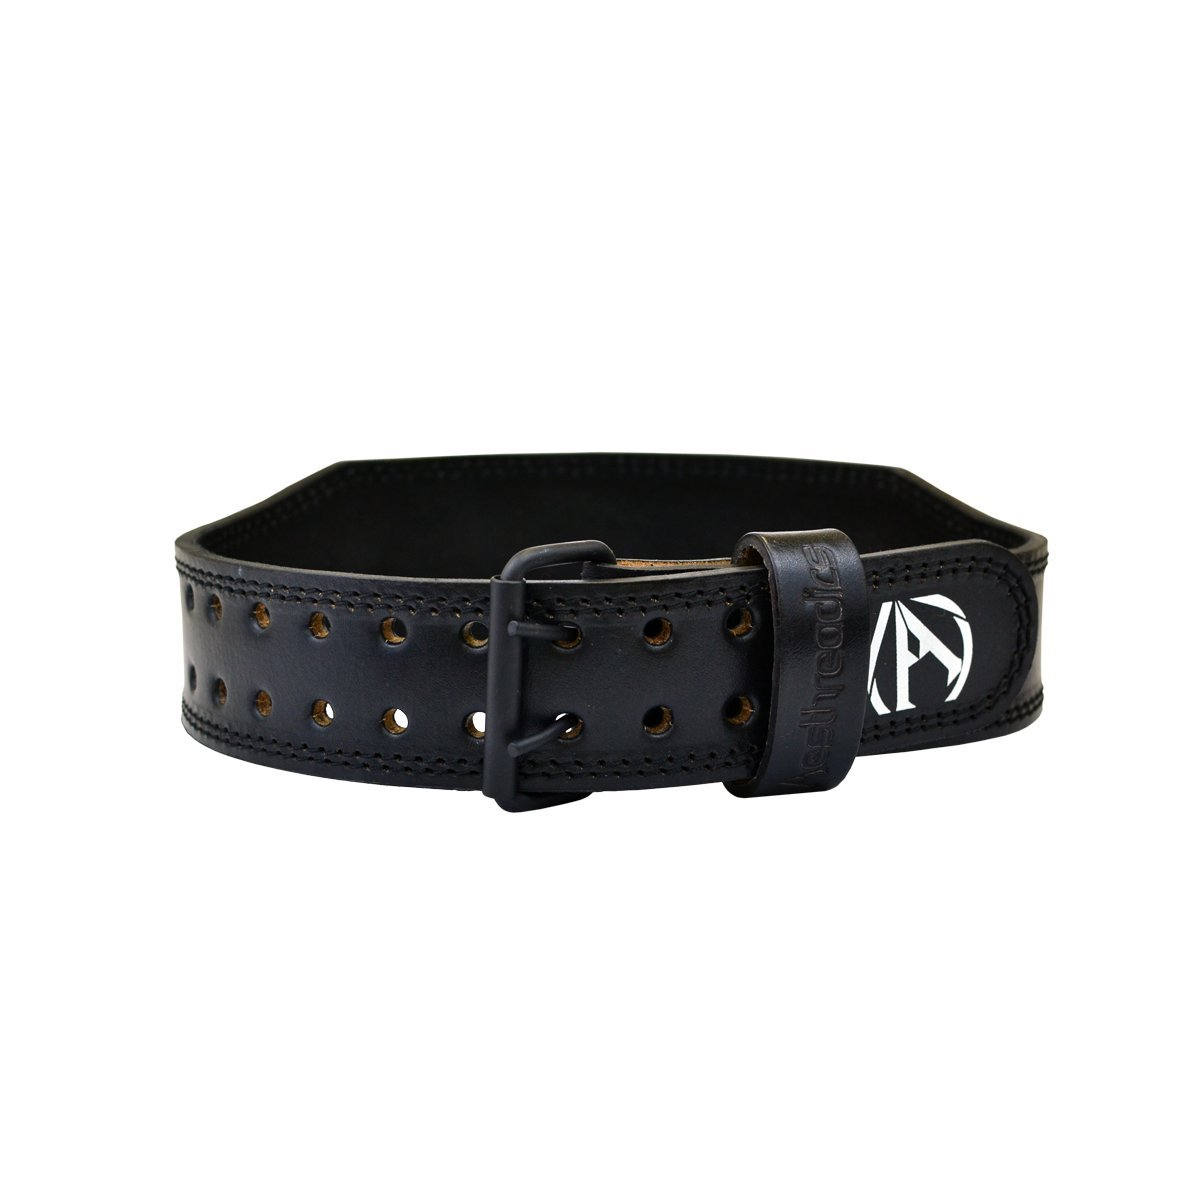 Aesthreadics Black Weight Lifting Belt (Medium 28-34) by Aesthreadics